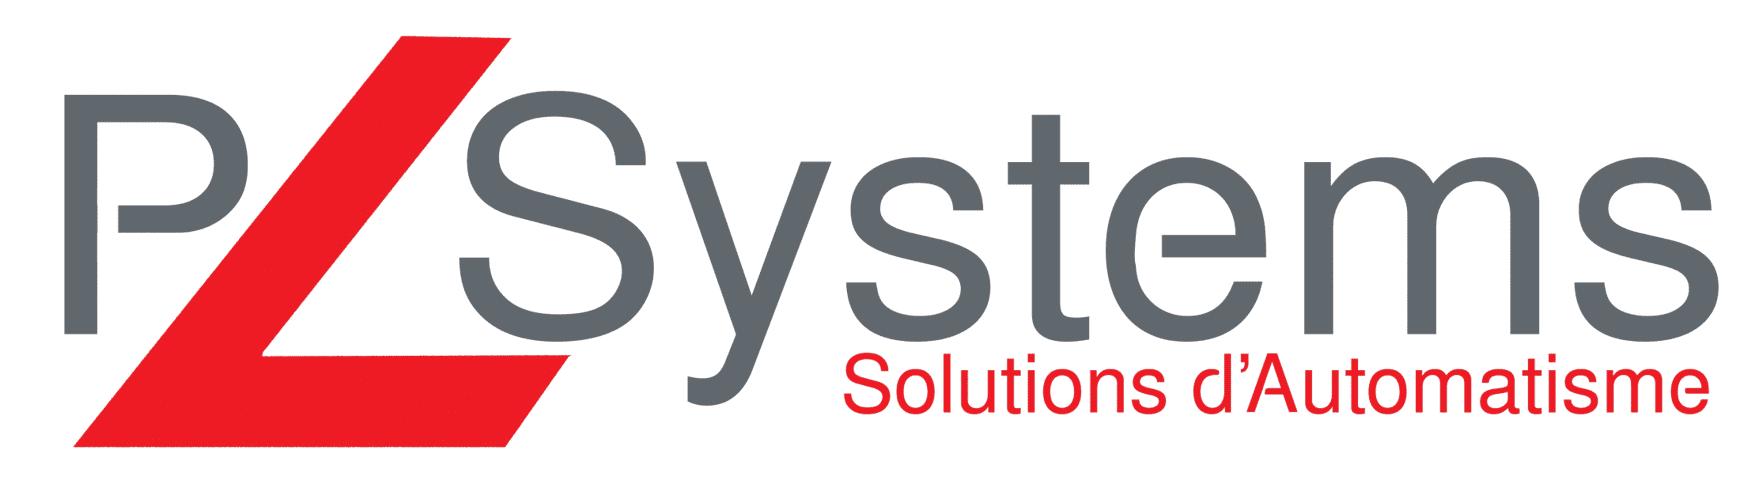 1630572165-pl-systems-unitronics-france.png